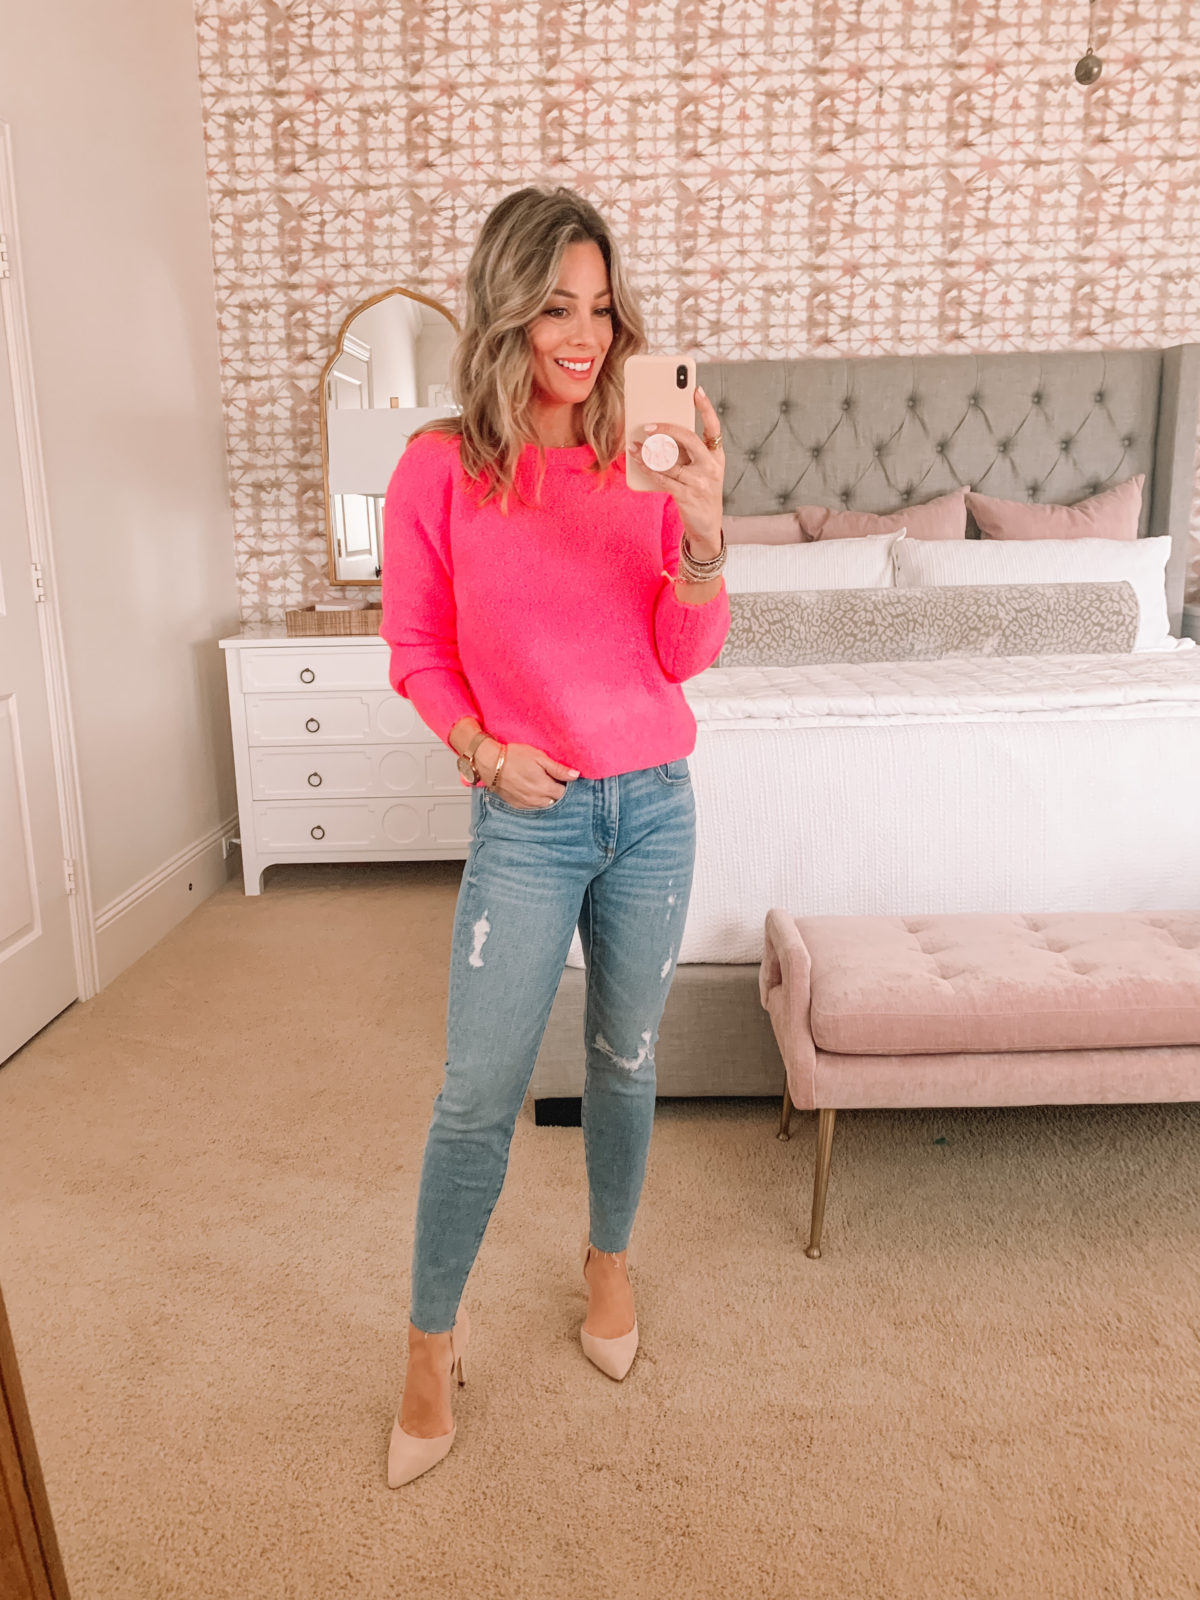 Dressing Room Finds, Pink Crewneck Sweater, Jeans, Heels